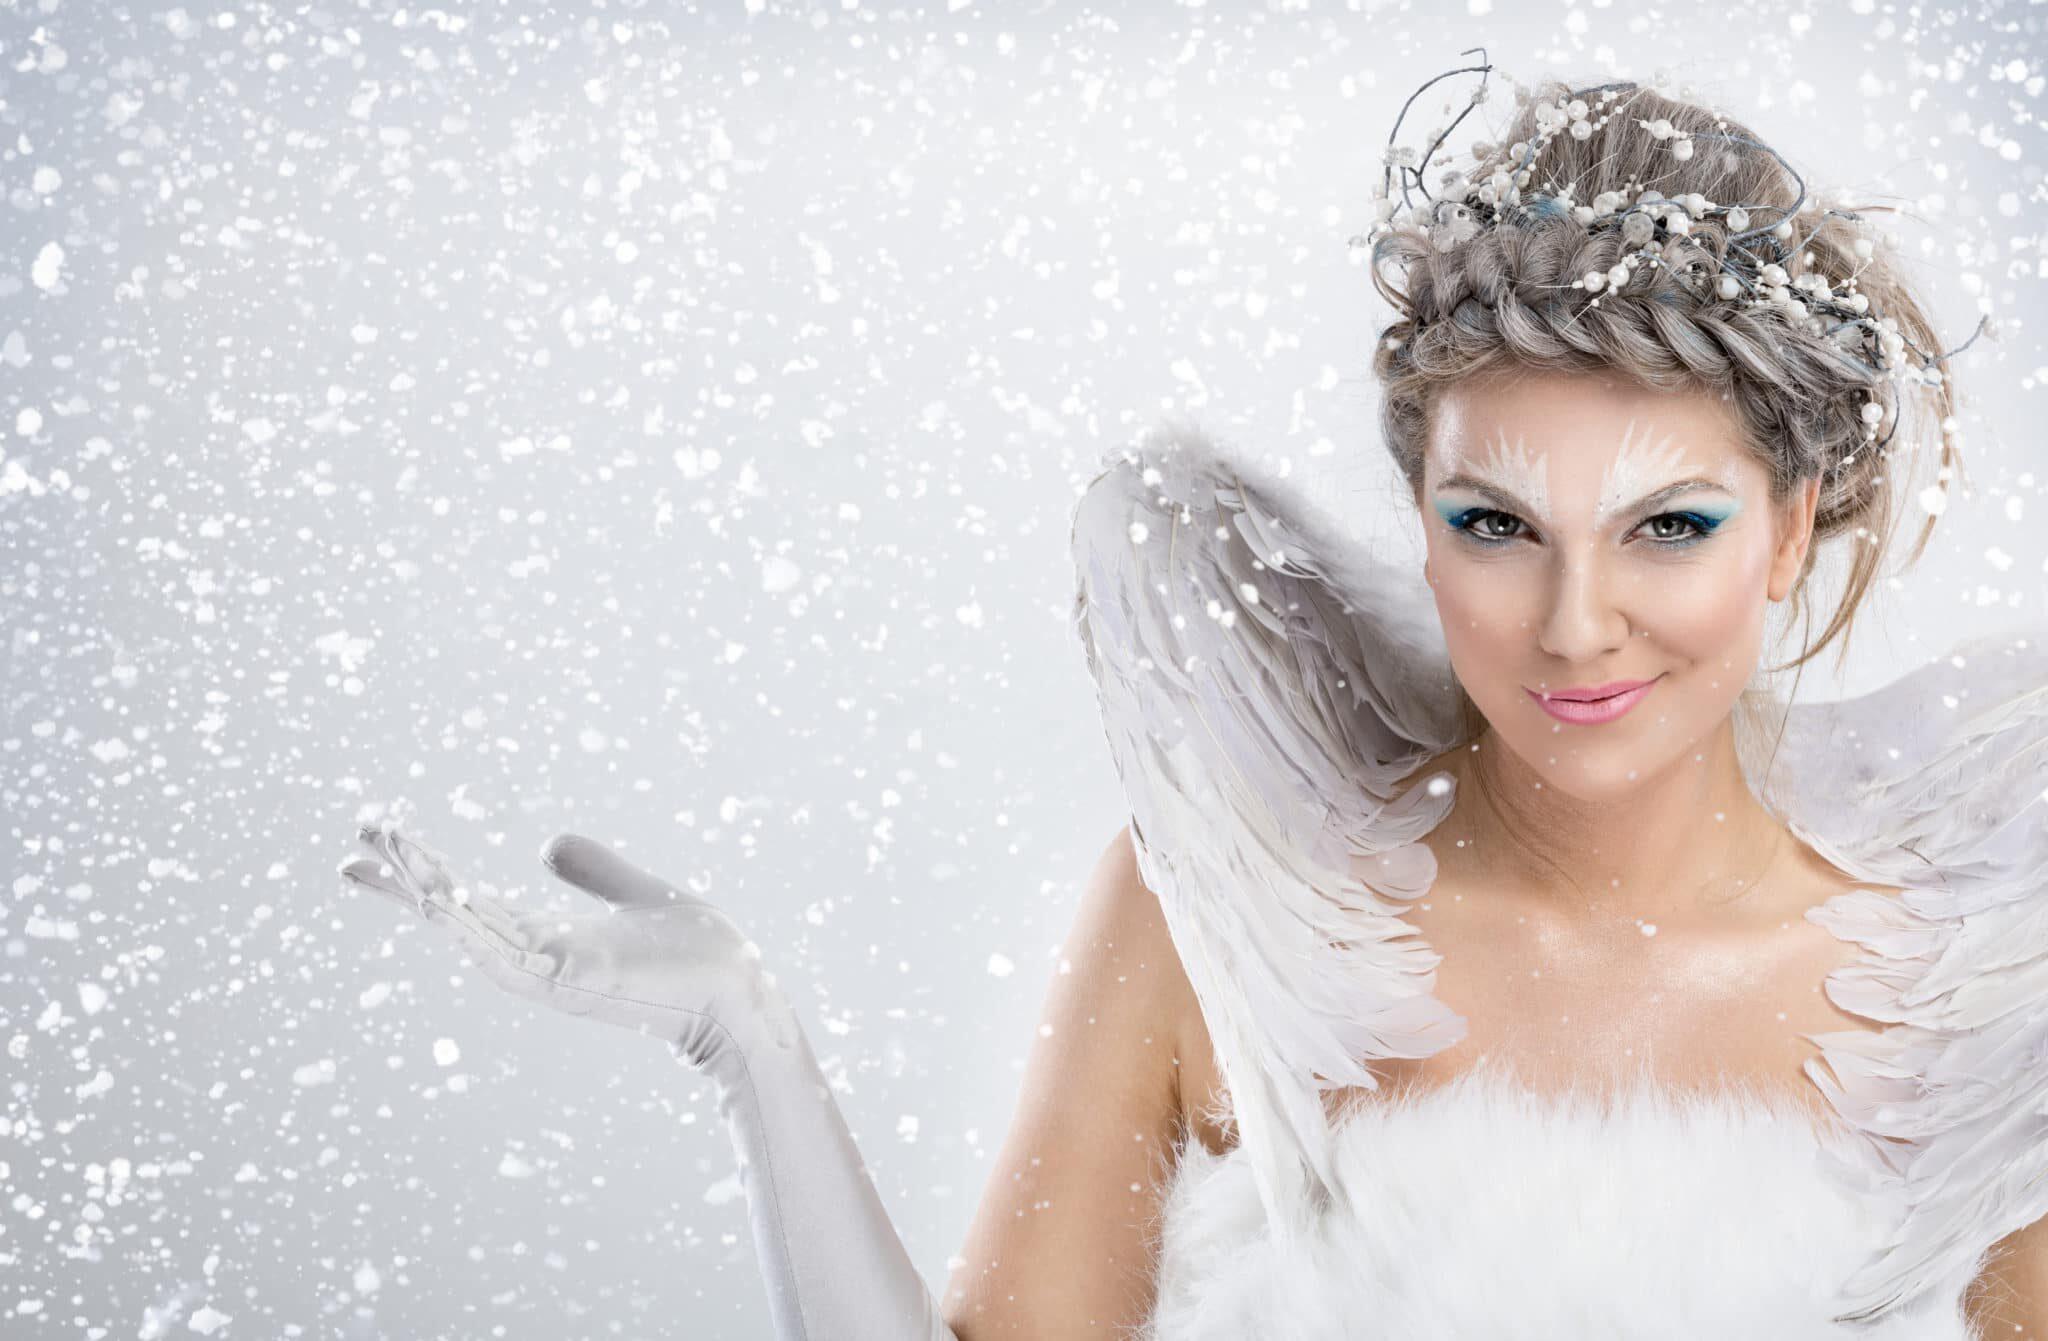 Winter Themed Entertainment 1